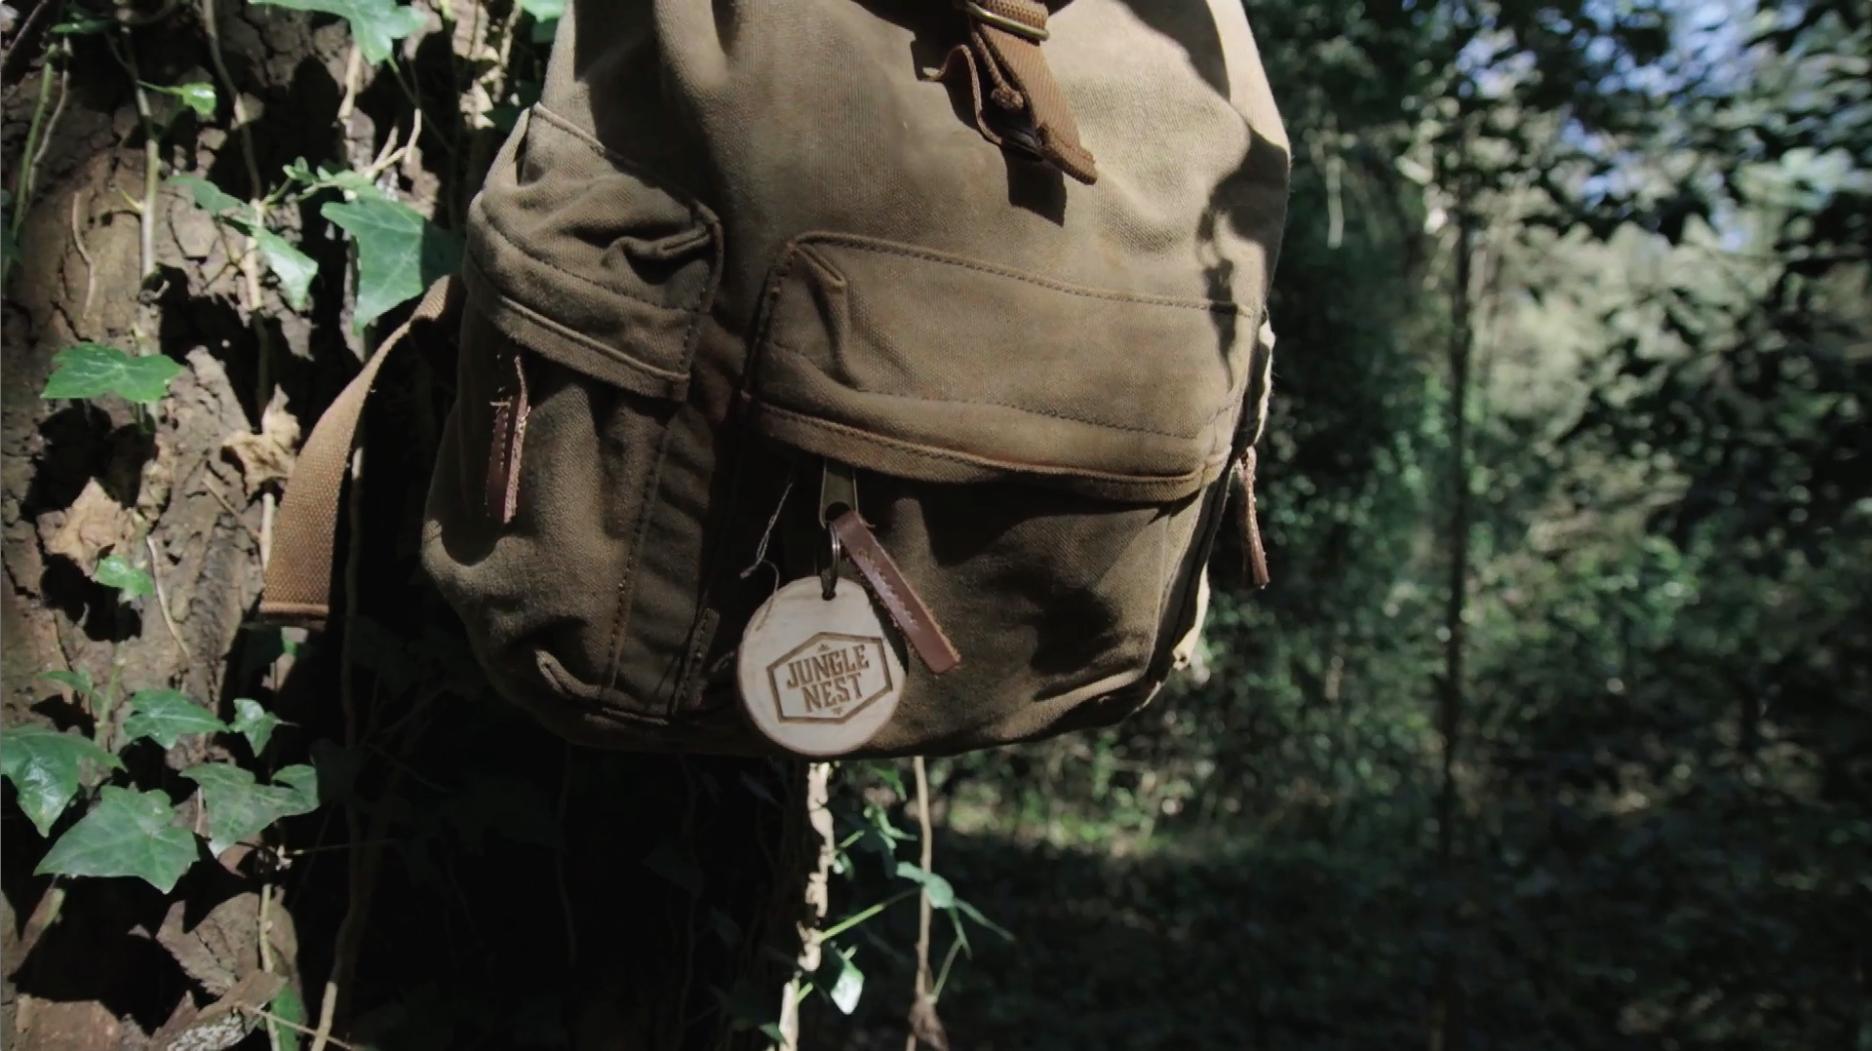 Teaser Mochila – Jungle Nest